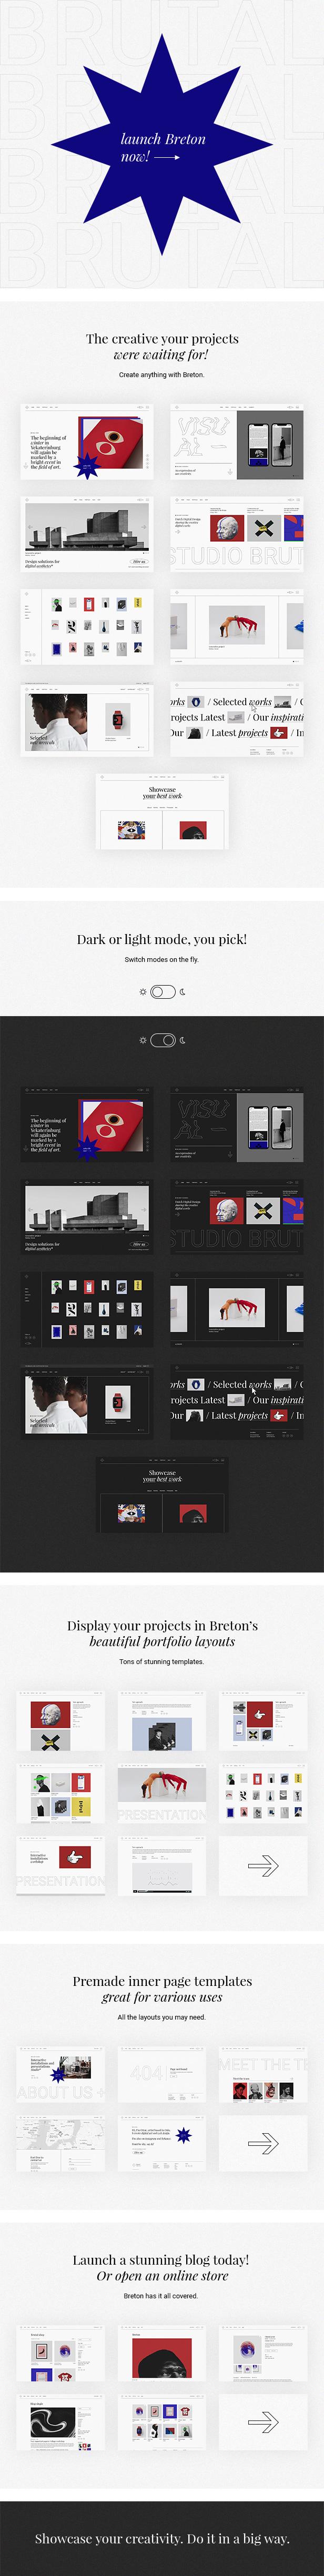 Breton - Creative Agency Theme - 2